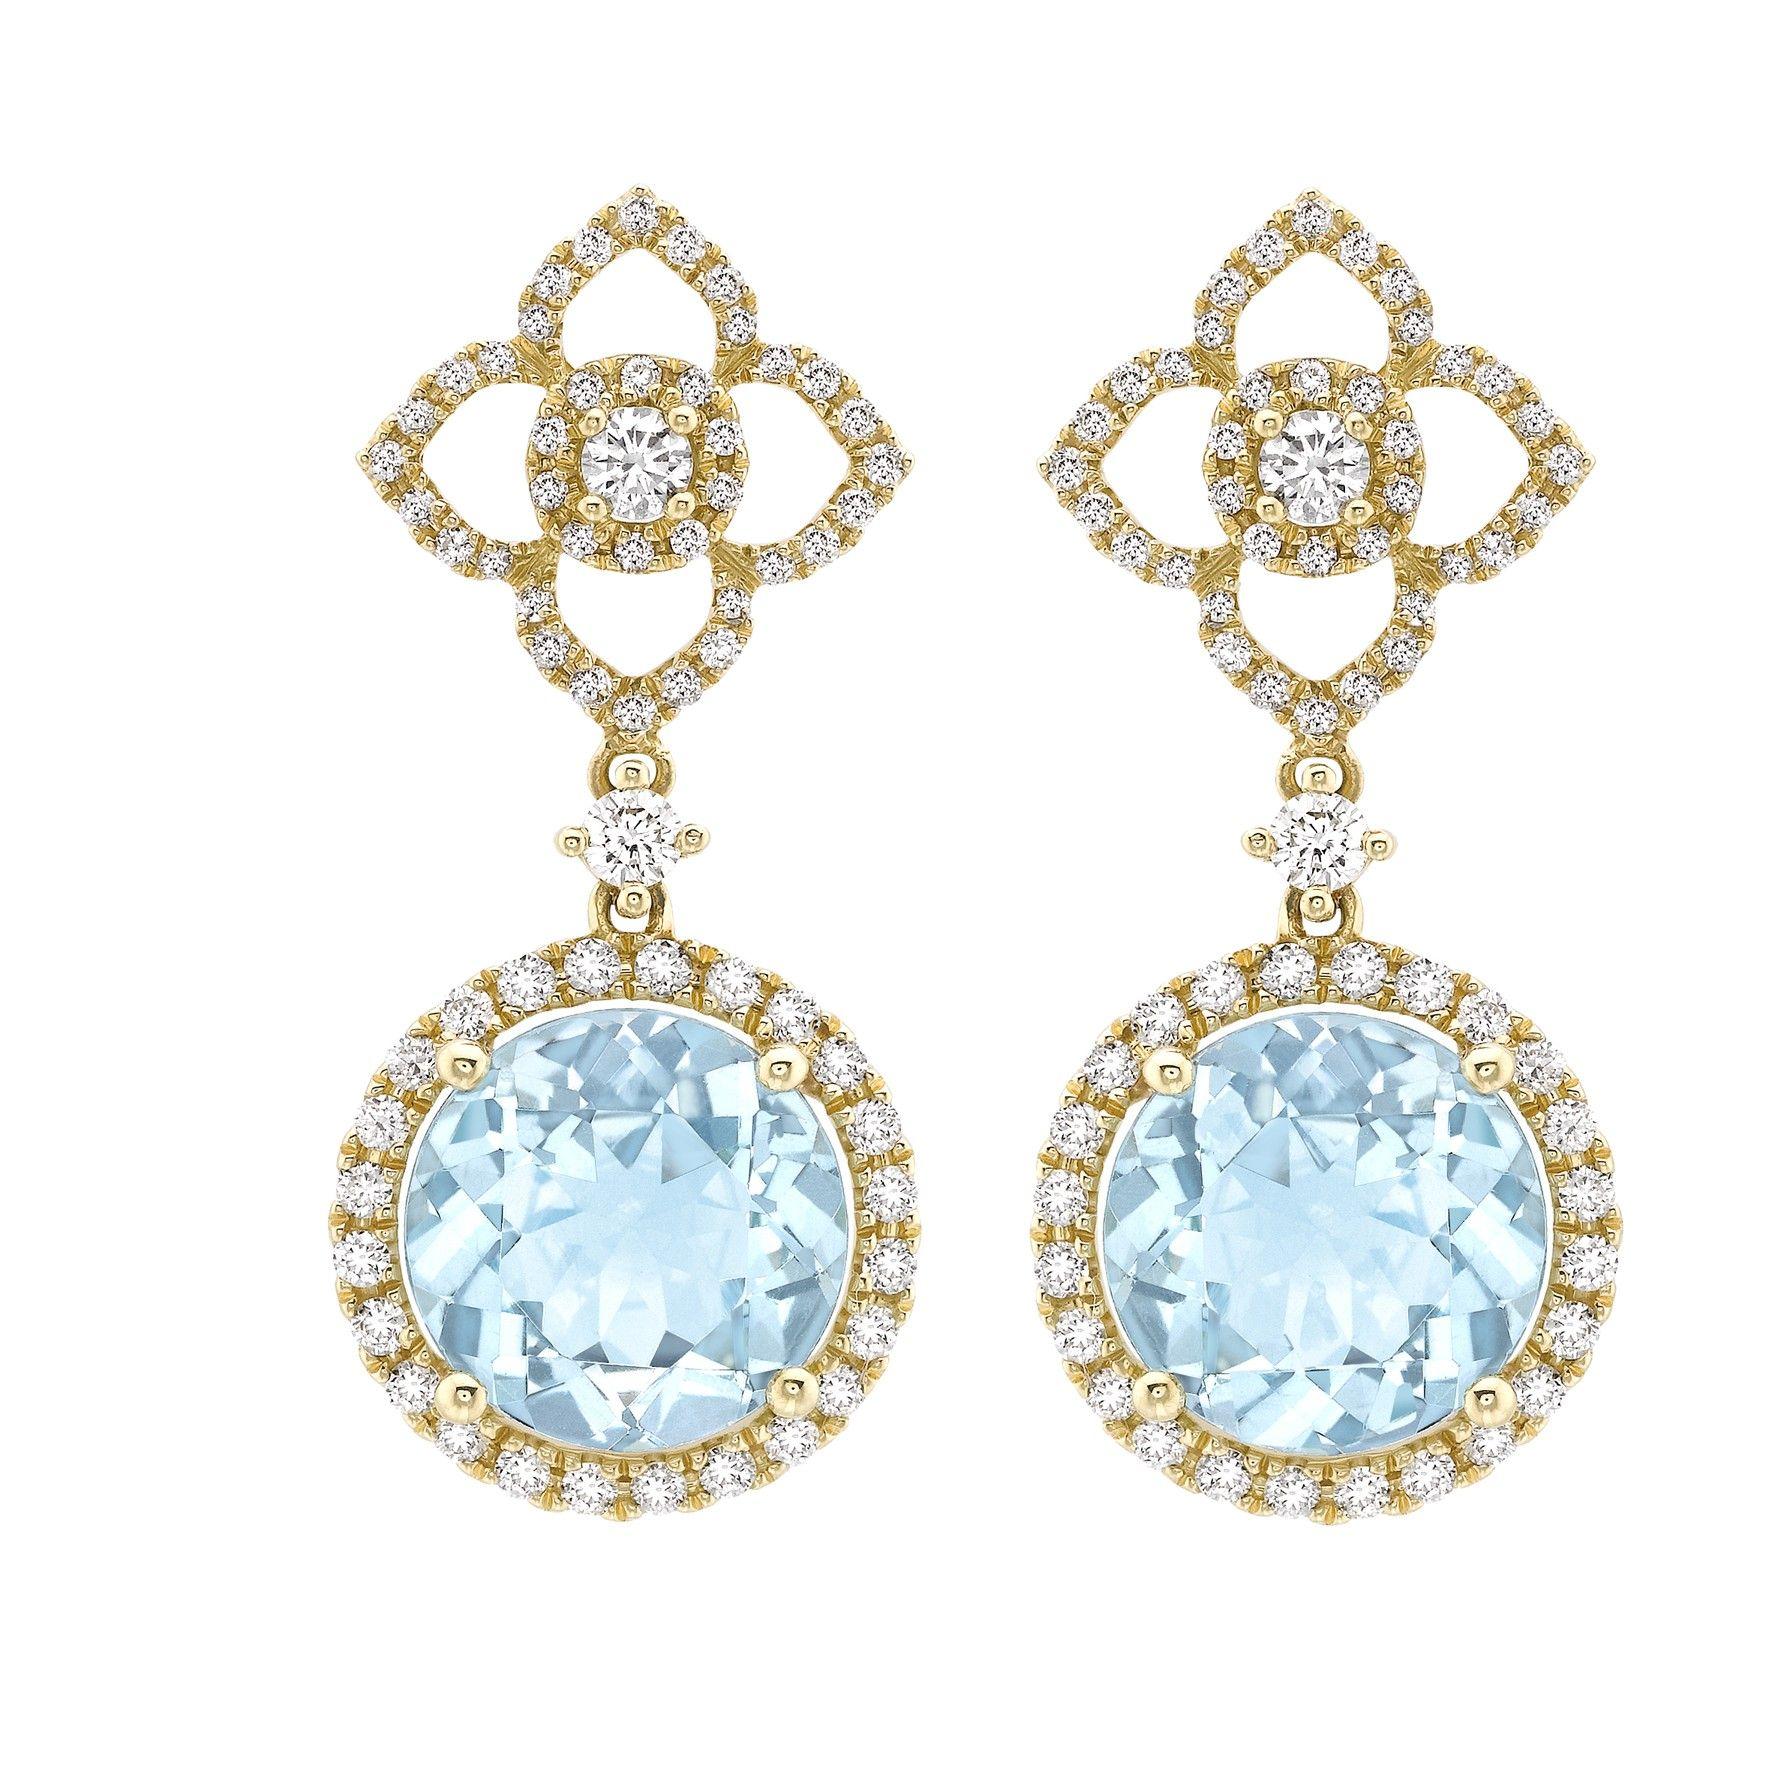 Aurora Blue Topaz and Diamond Drop Earrings An absolutely